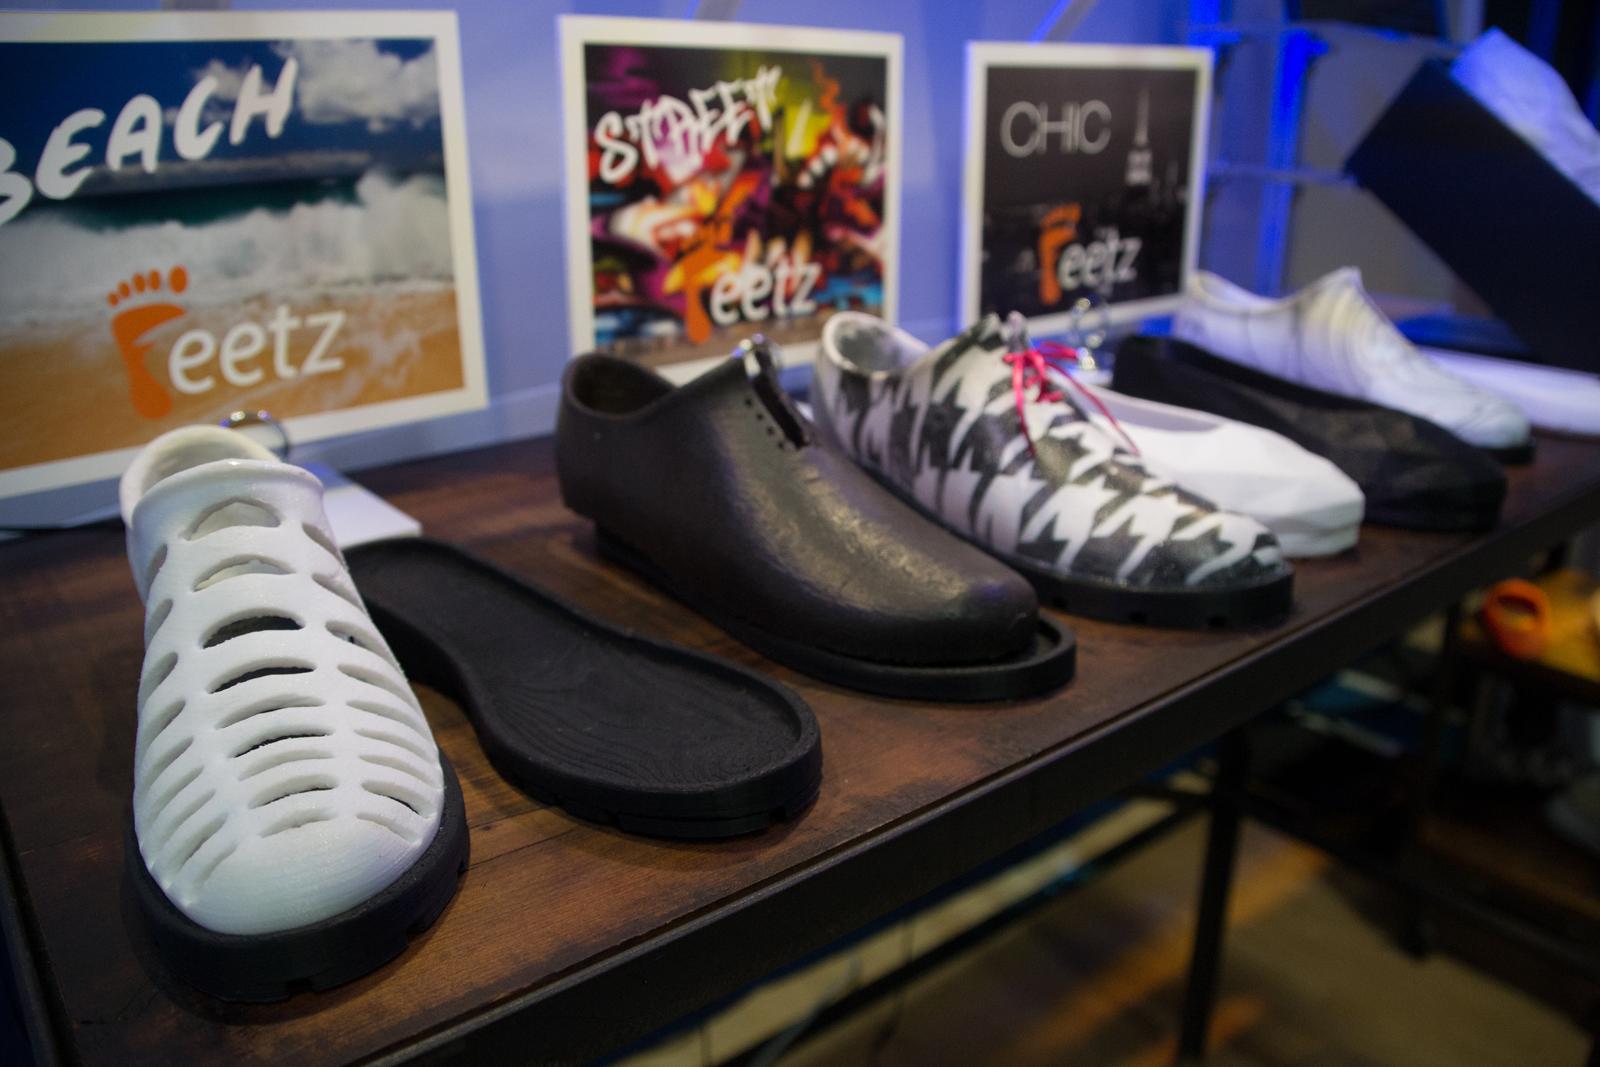 Feetz 3D printed shoe prototypes